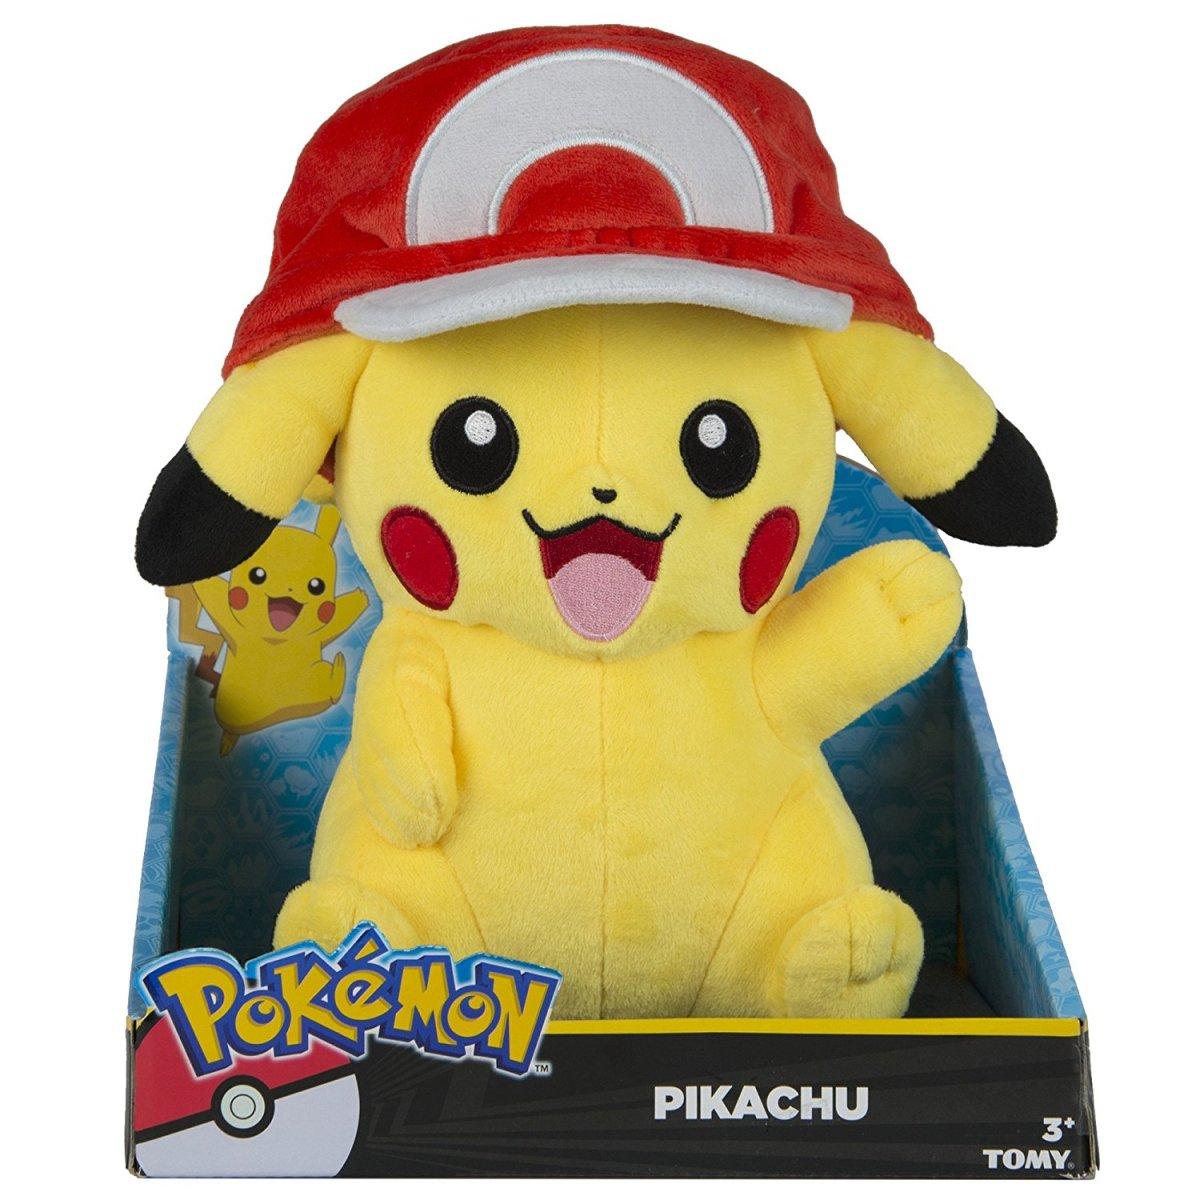 Pikachu Cuddly Plush Toy